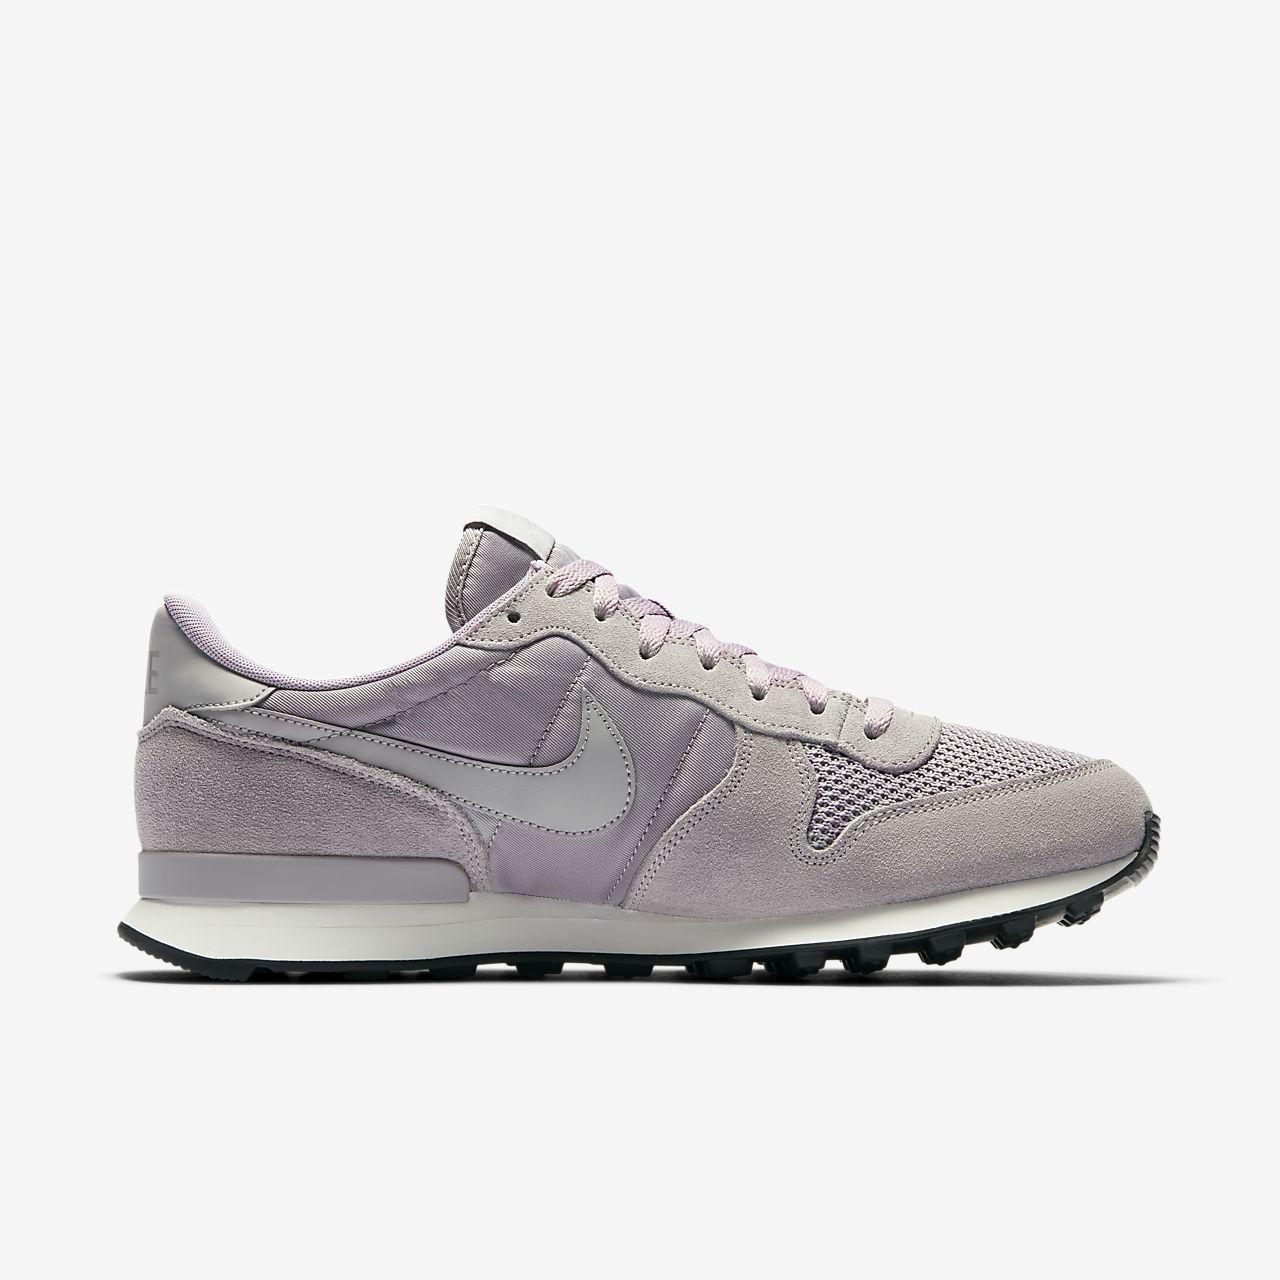 Nike Chaussures Noires Internationaliste Soi jn041aIVC2